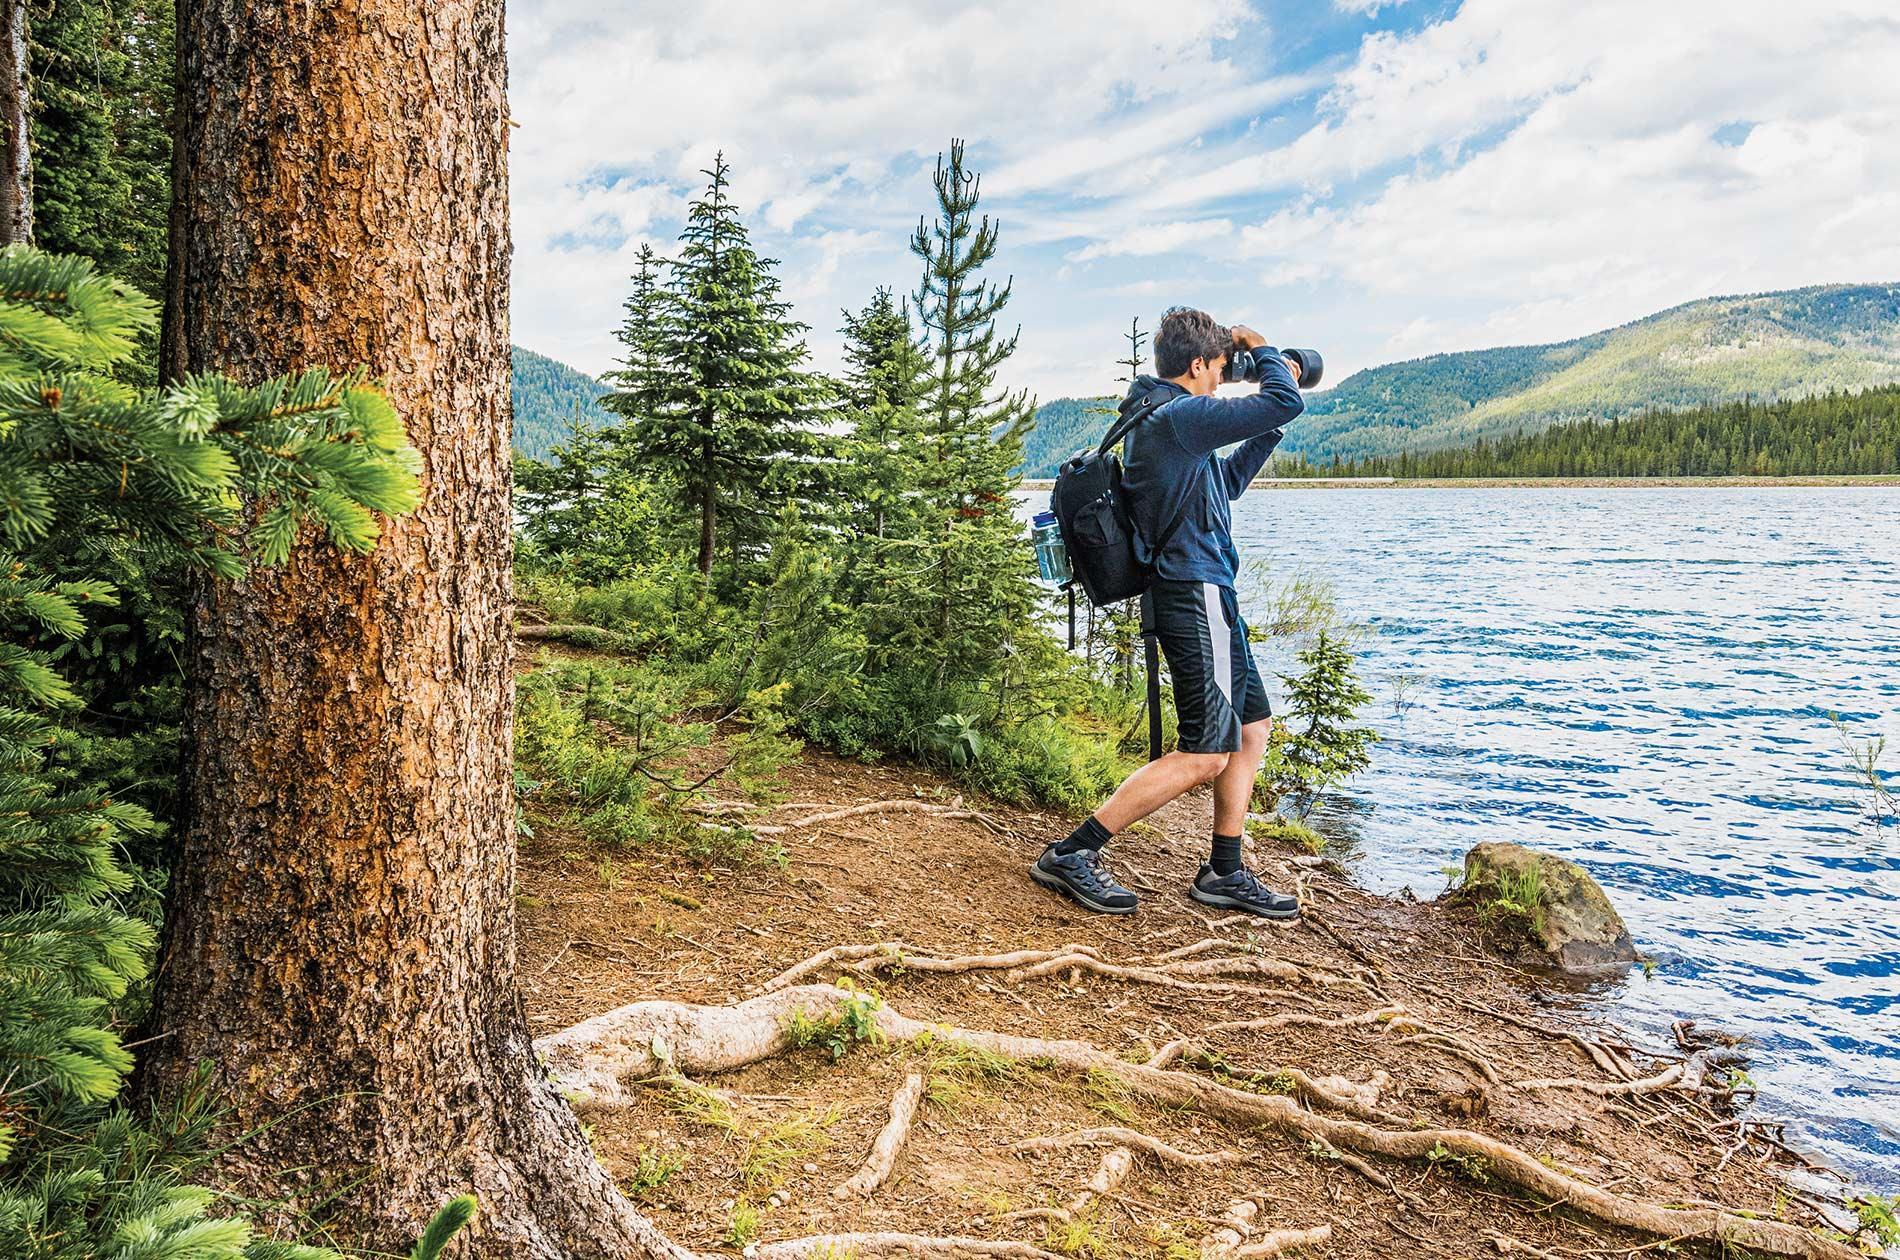 Yellowstone Wildlife Photography Workshops Amp Tours